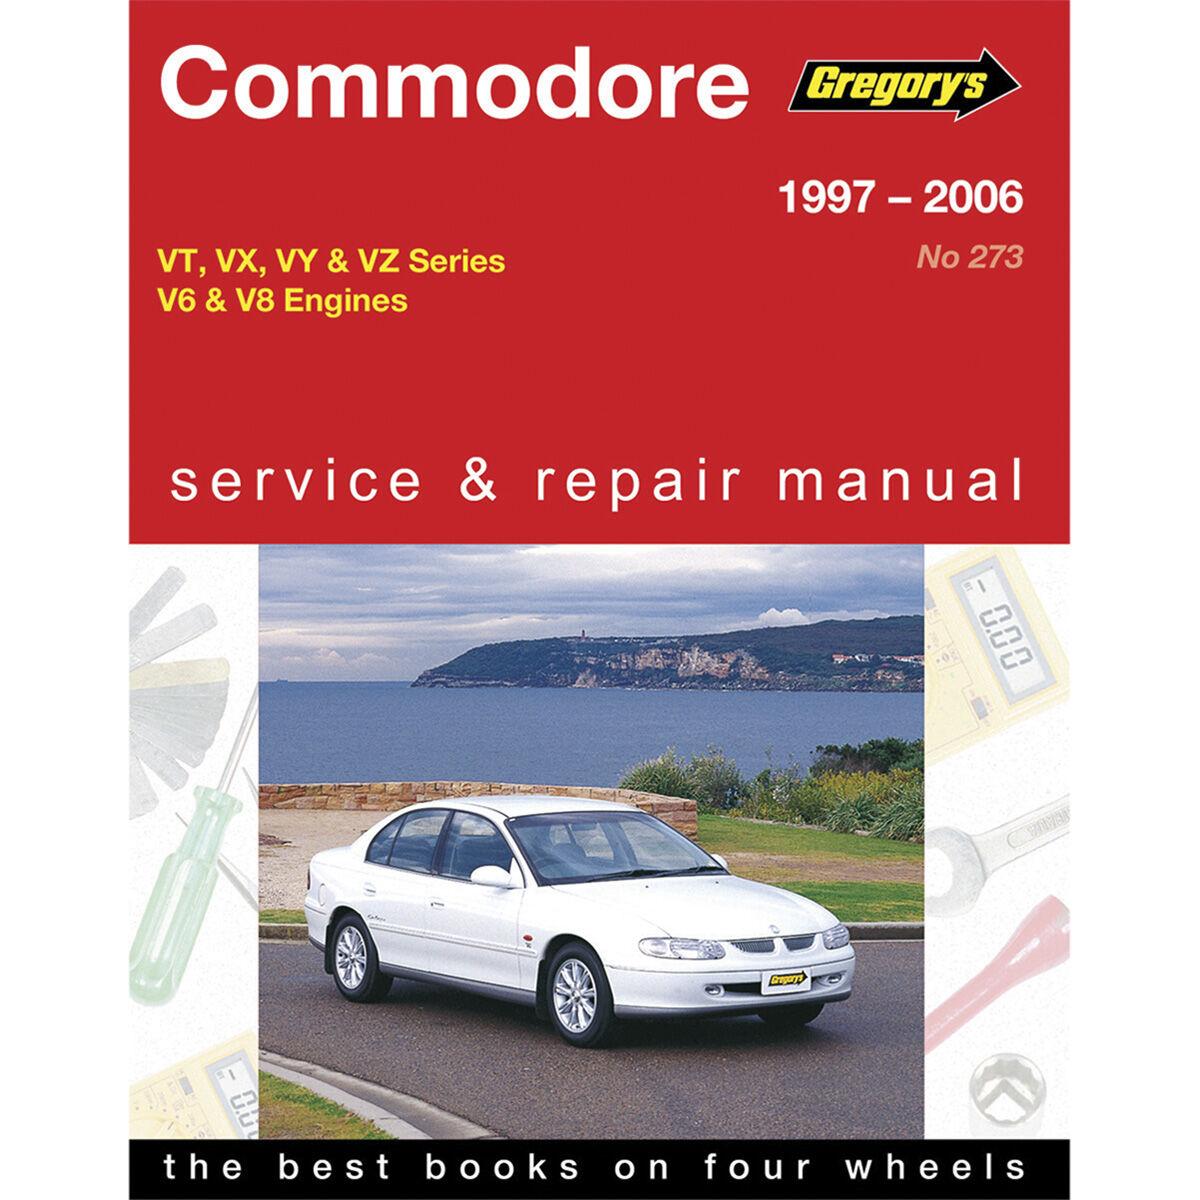 car manual for holden commodore 1997 2006 273 supercheap auto rh supercheapauto com au holden car manuals holden cruze car manual